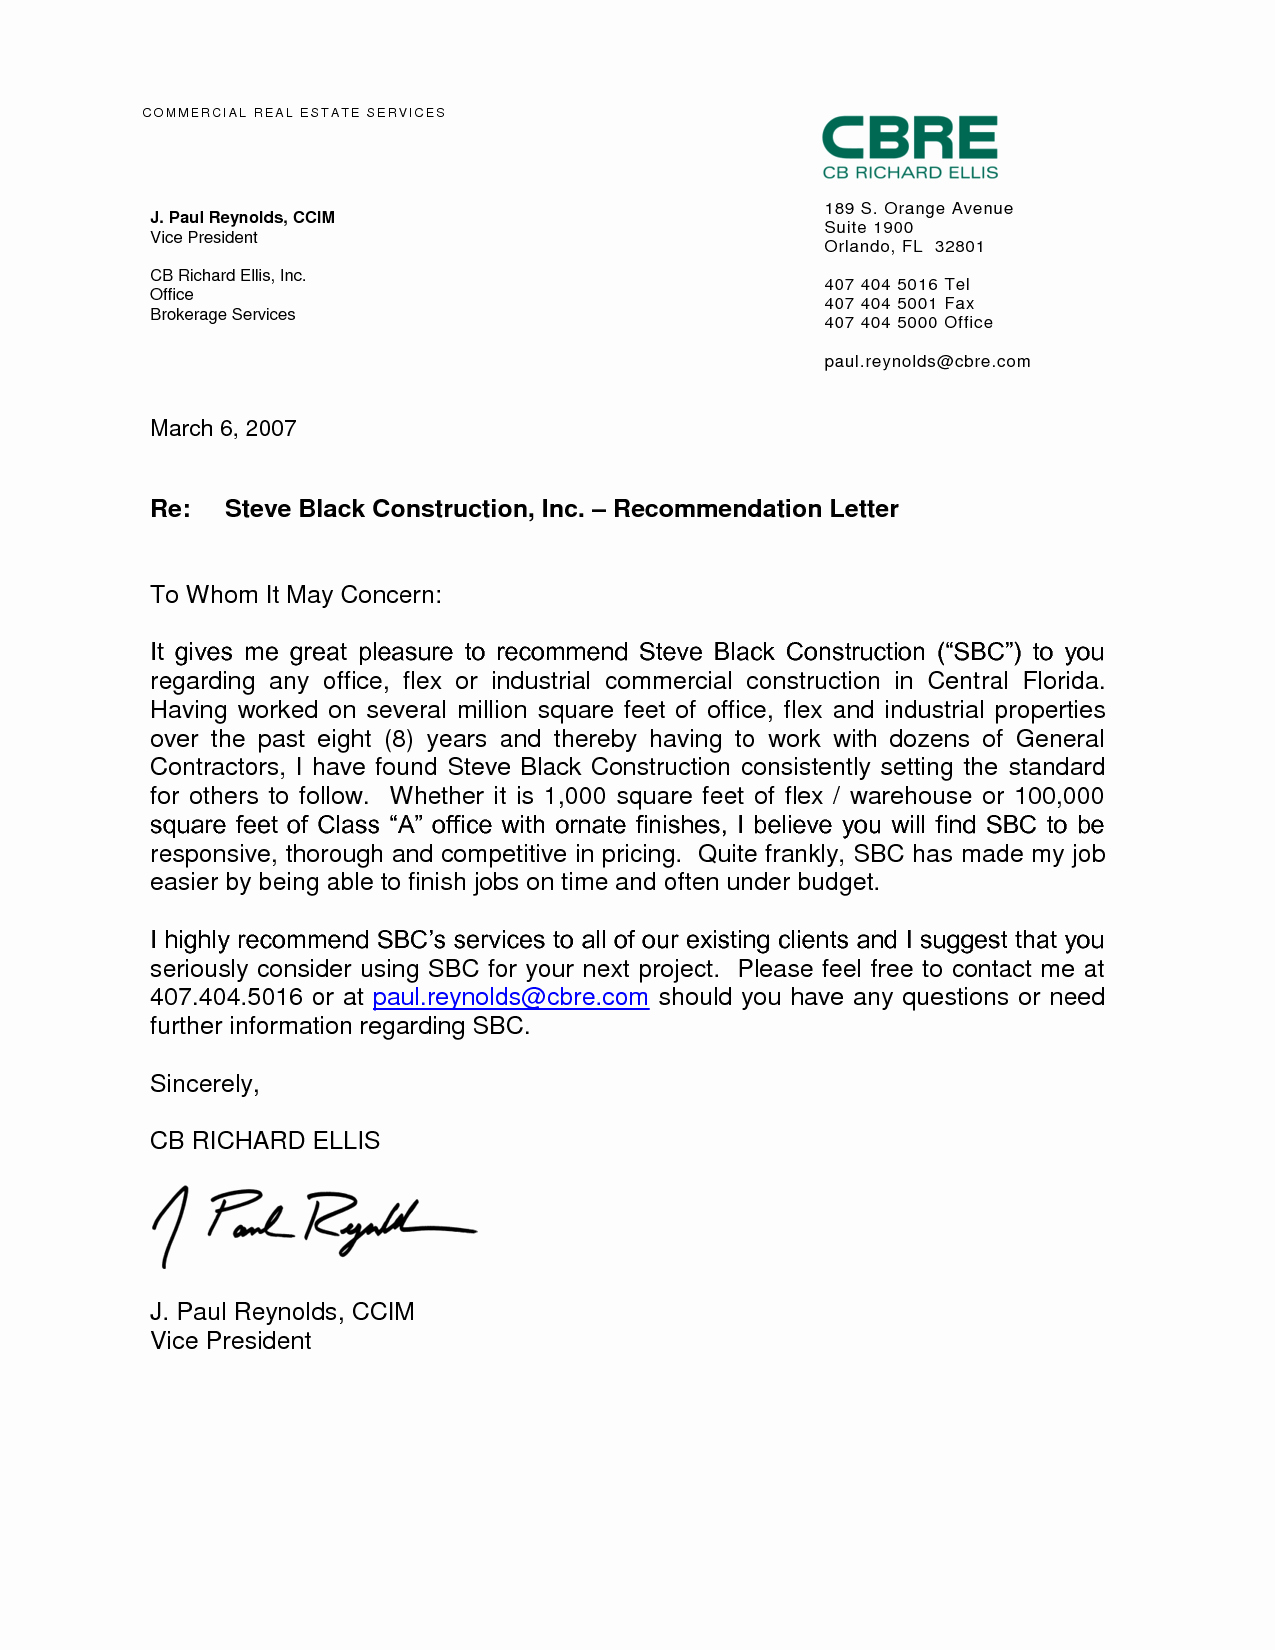 Job Recommendation Letter Sample Best Of Reference Letter for A Job Best Letter